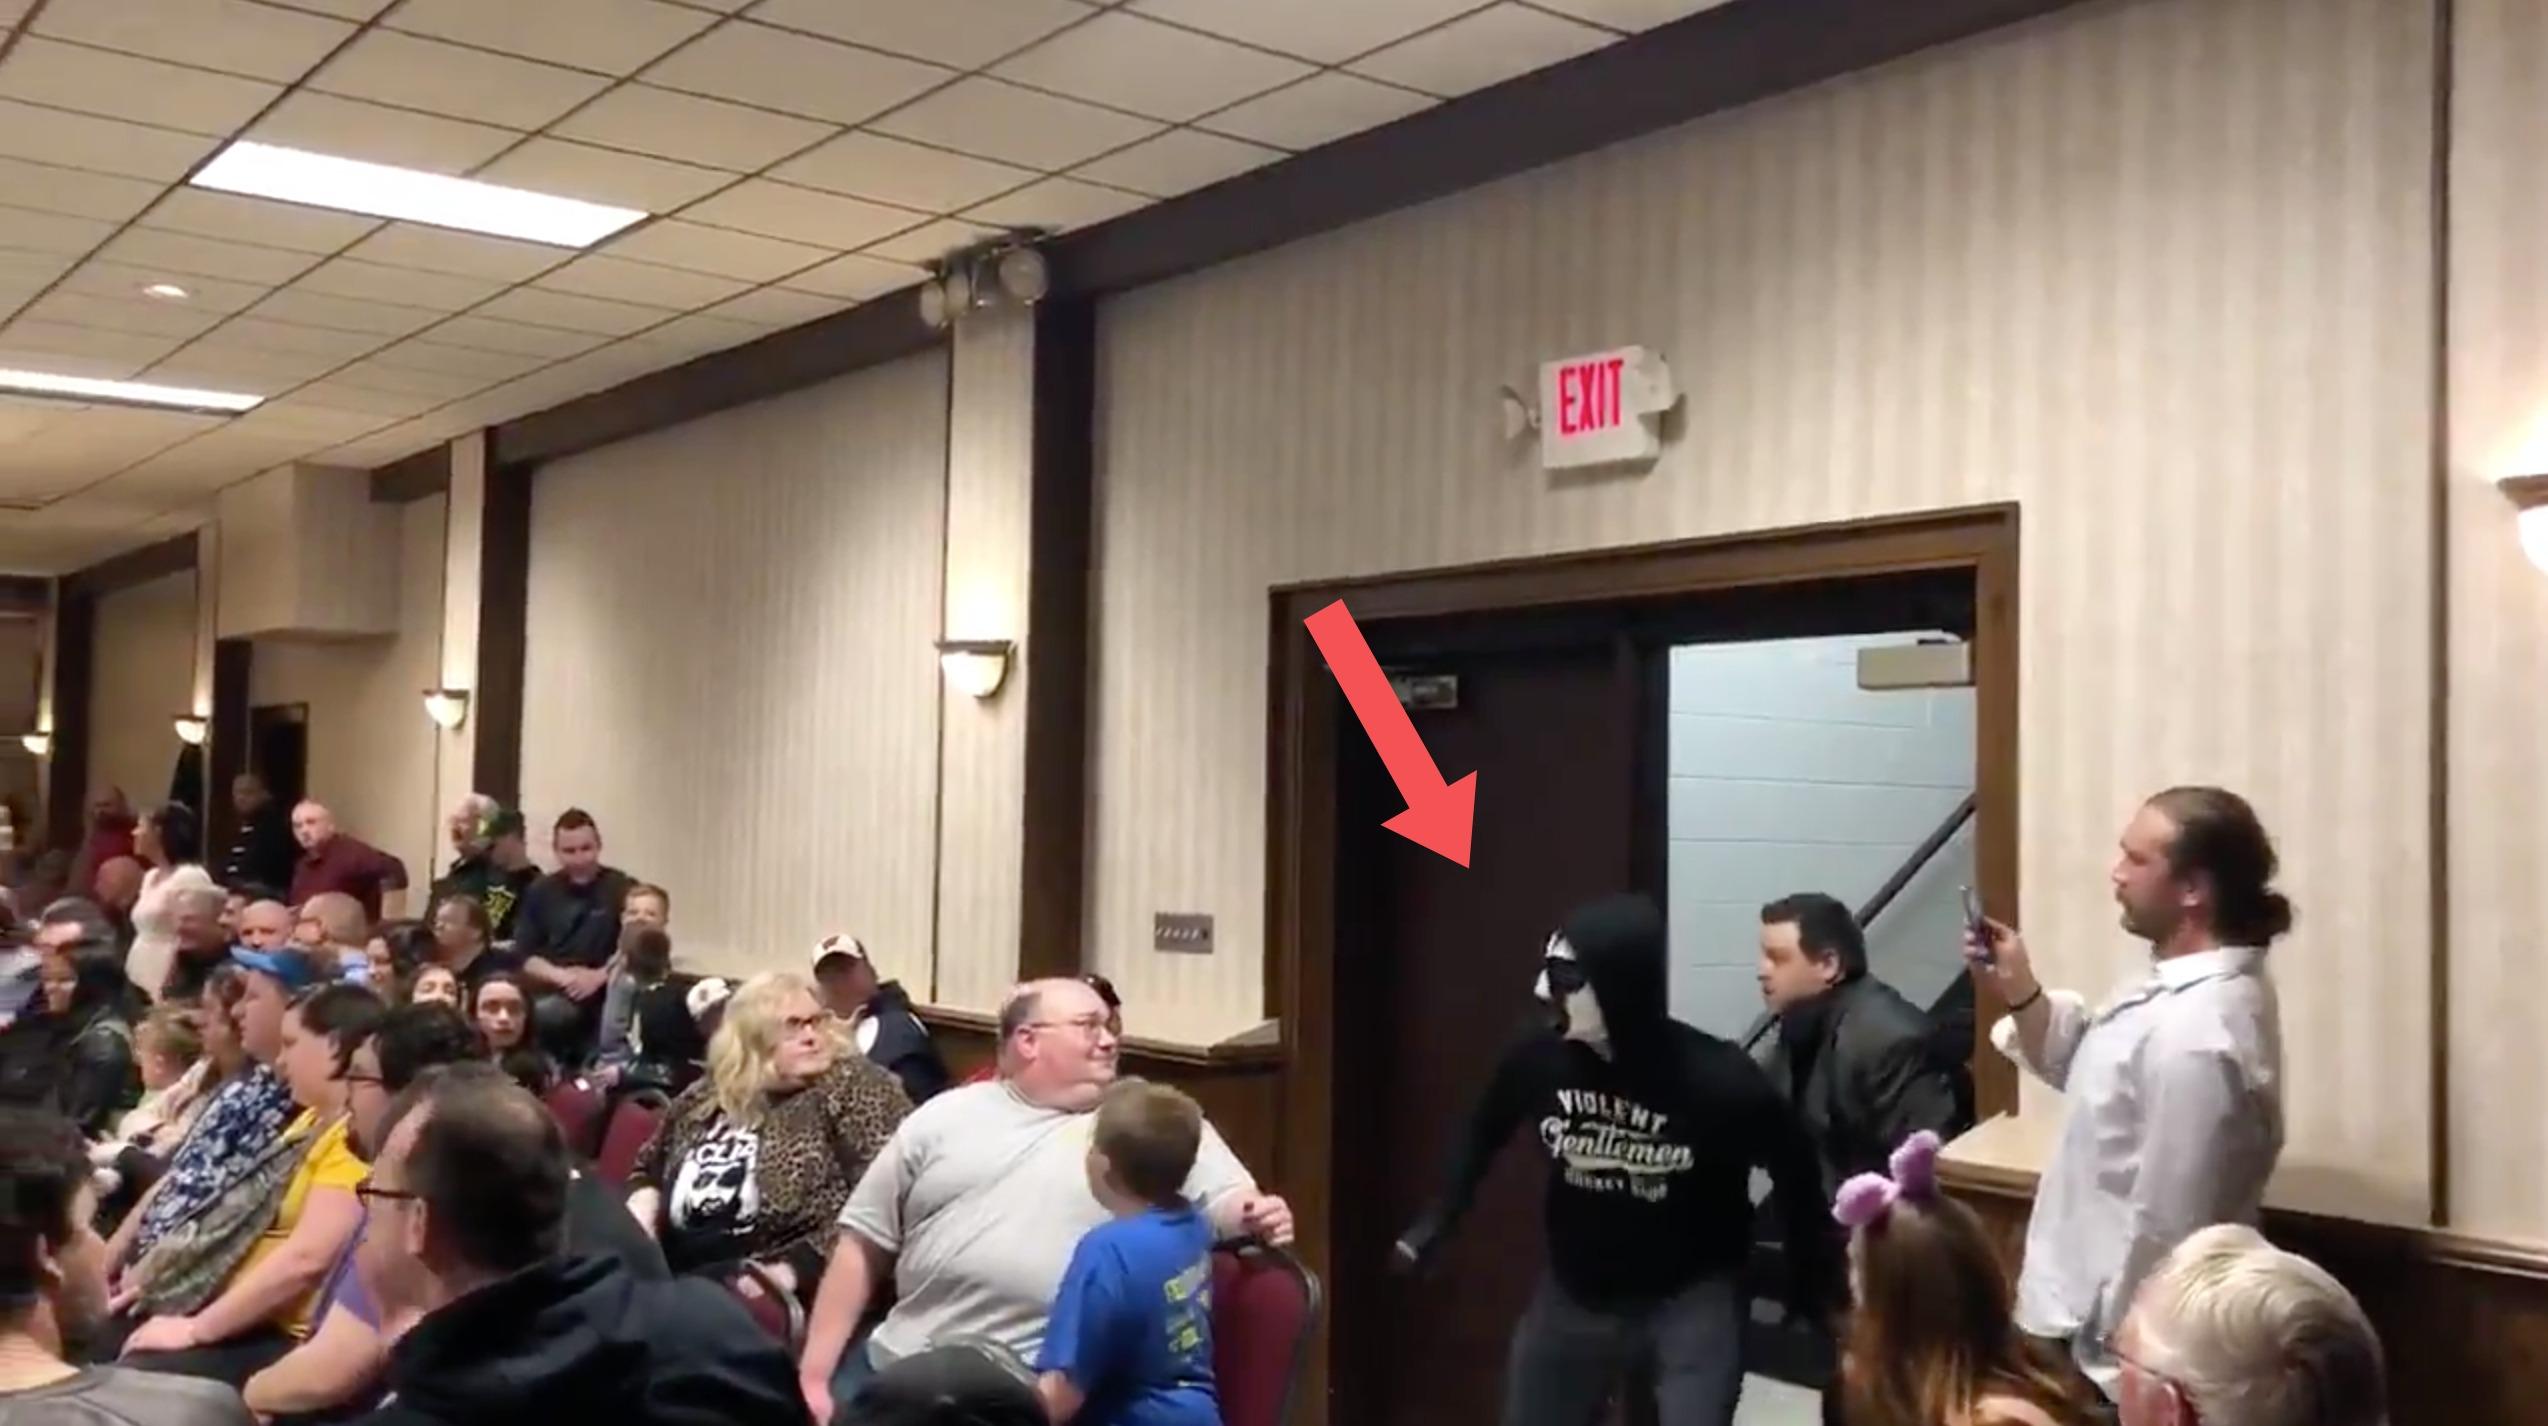 CM Punk returns to wrestling under mask in Milwaukee (video)